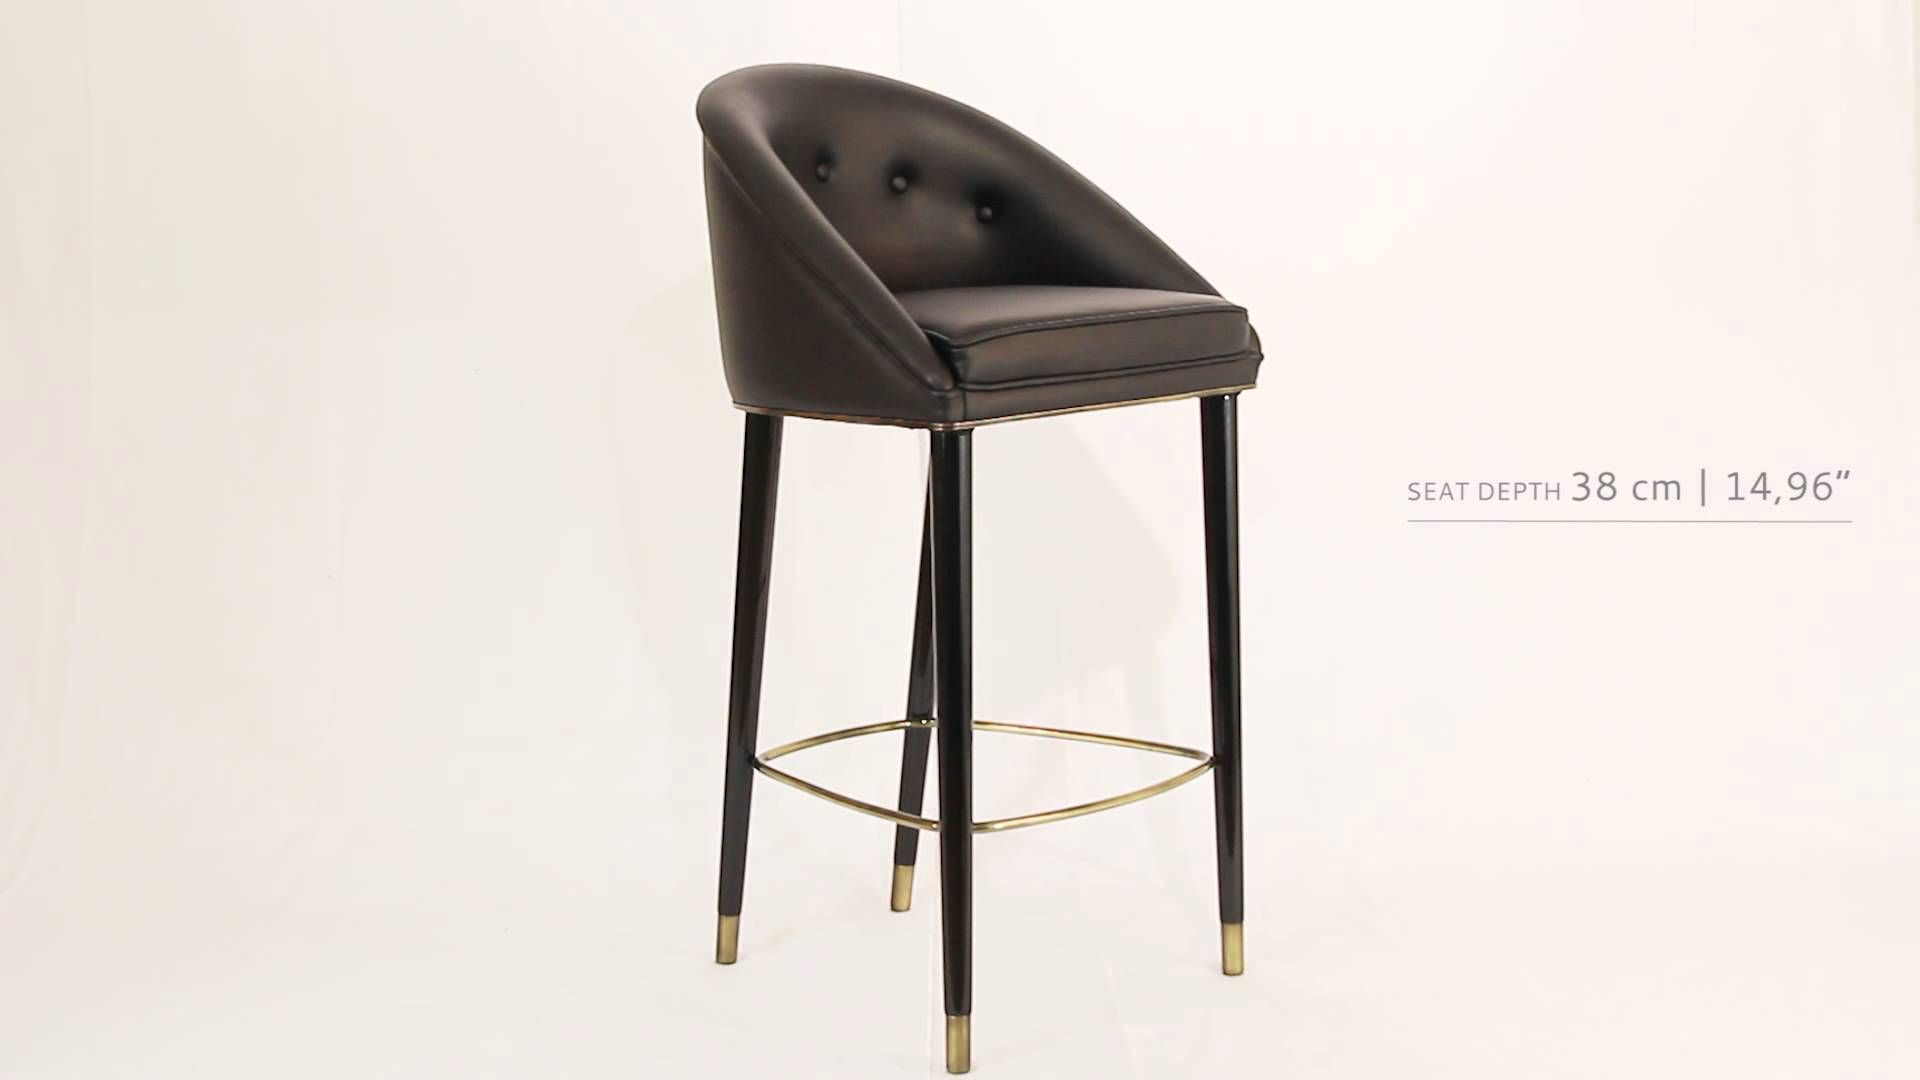 stool chair in malay steelcase bar by brabbu videos pinterest